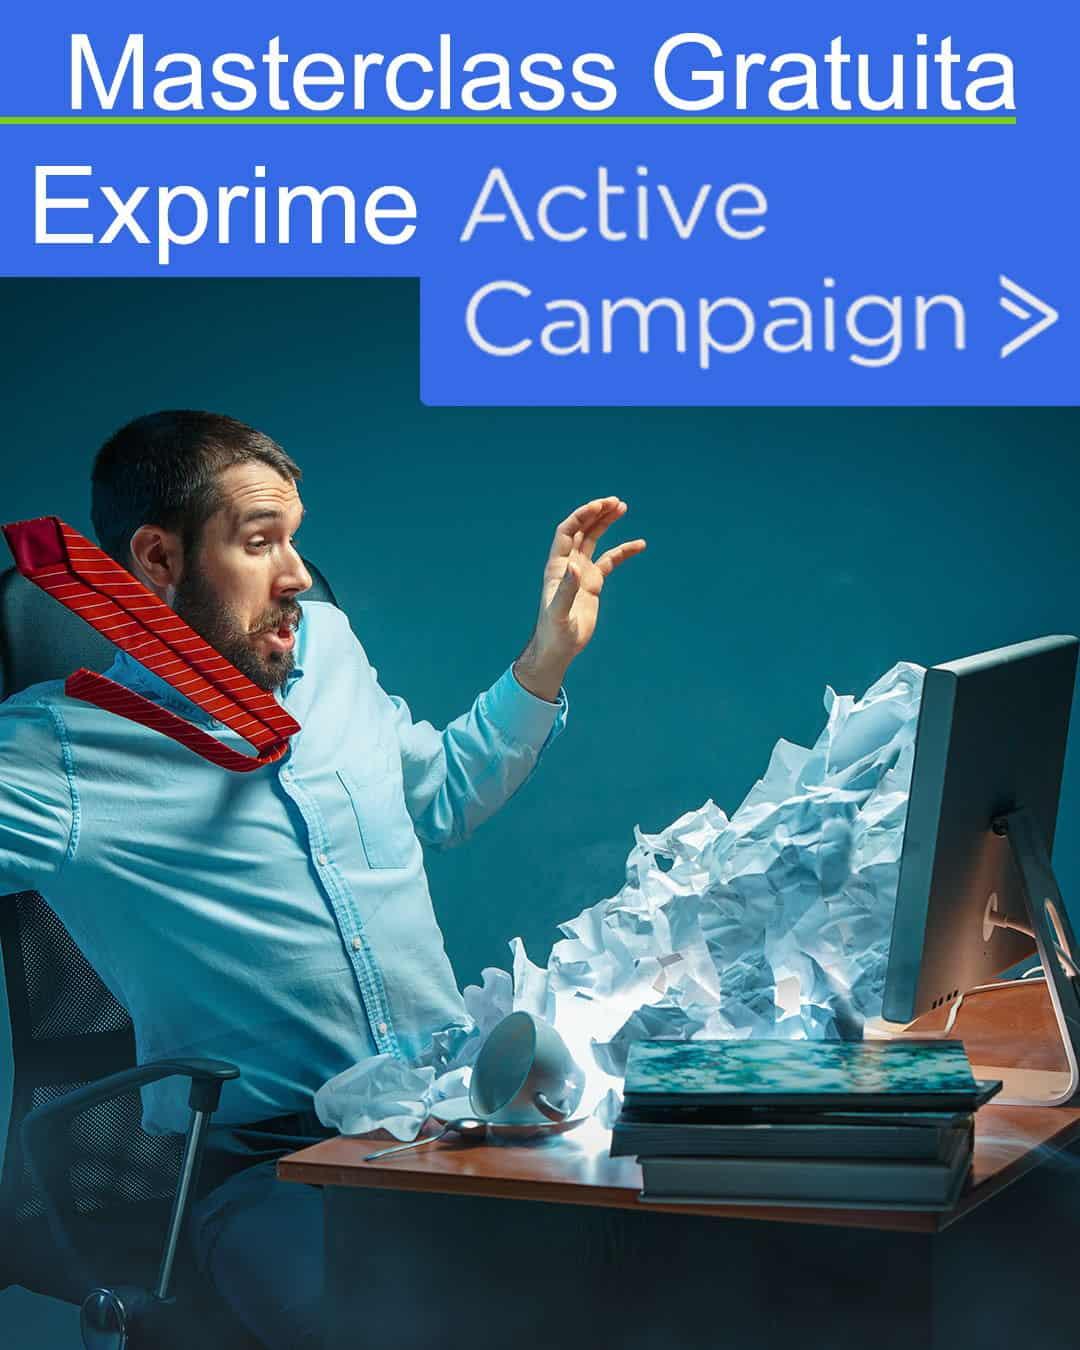 Masterclass ActiveCampaign